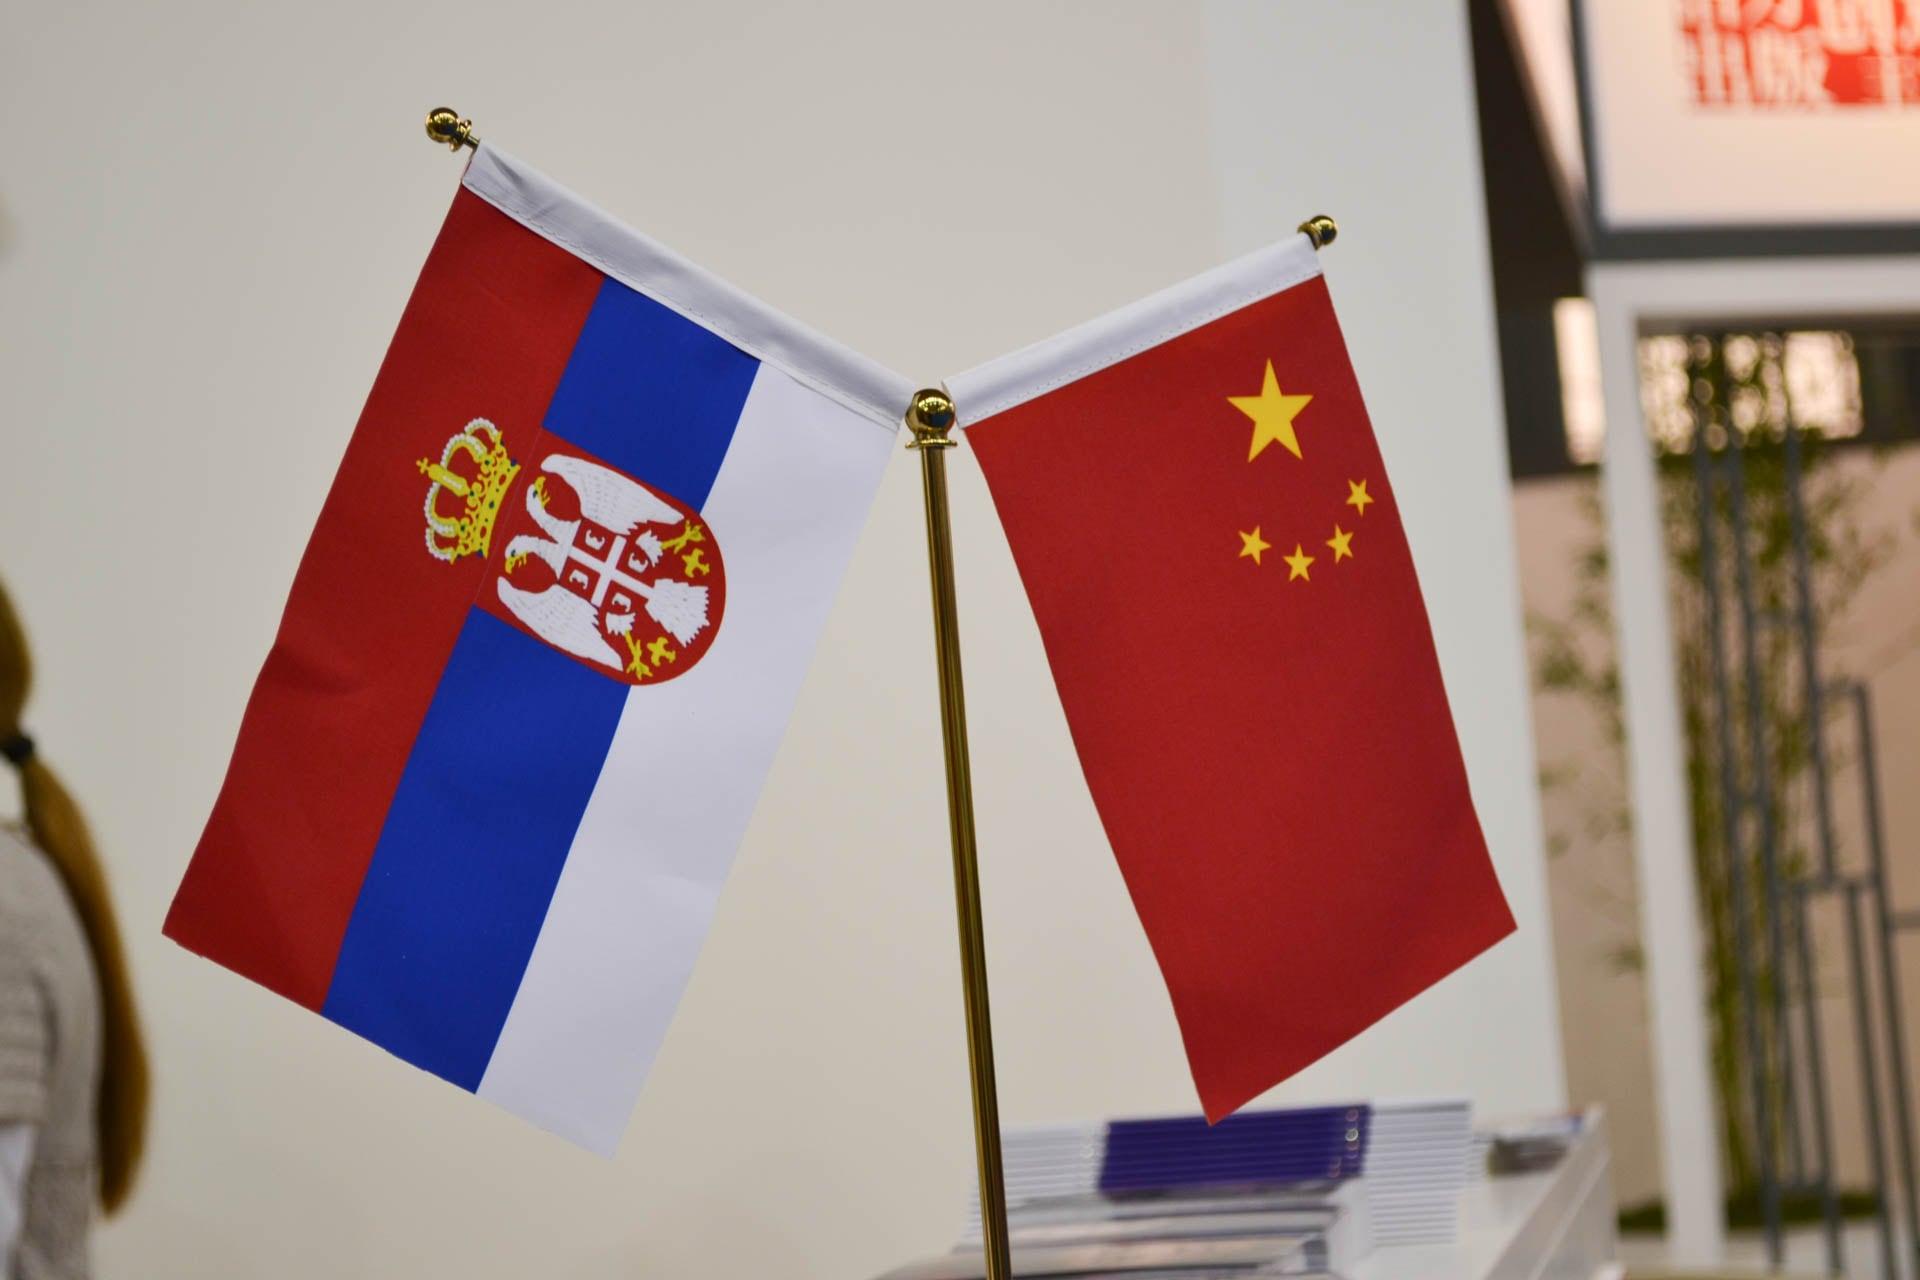 Studija: Srbija ispred država Centralne Evrope po broju kineskih investicija